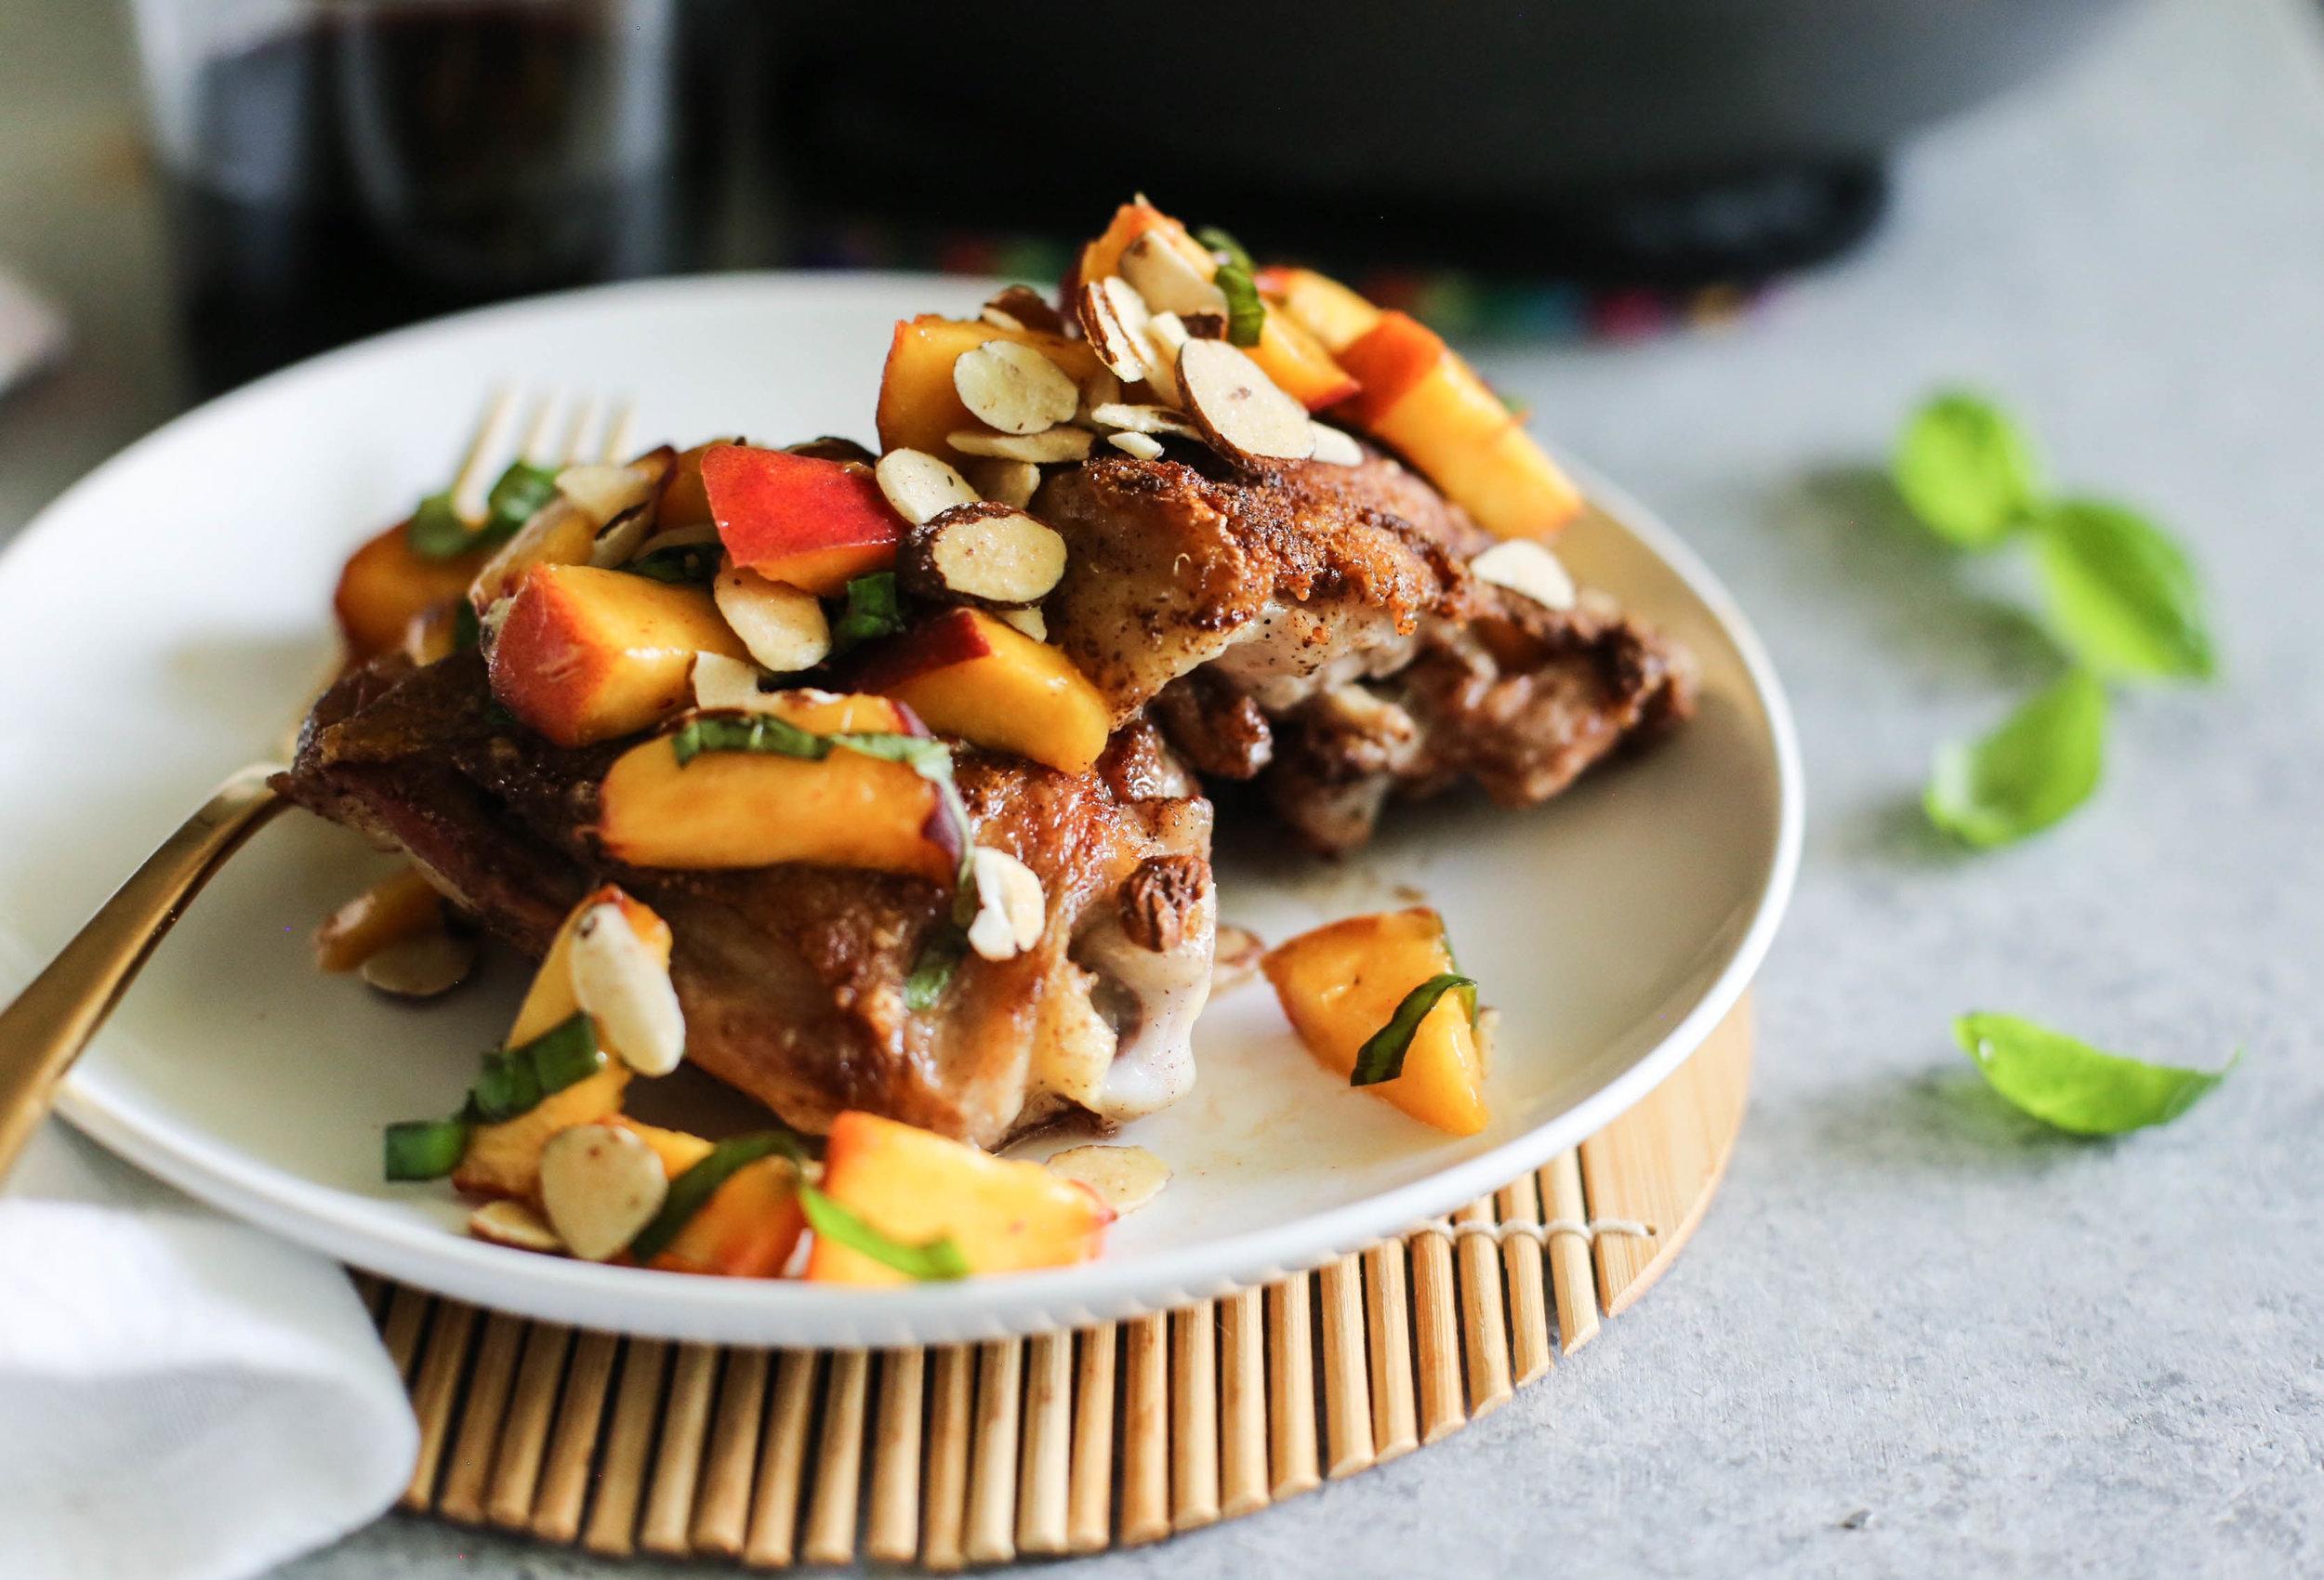 Crispy Cinnamon Spiced Chicken Thighs with Peach Salsa